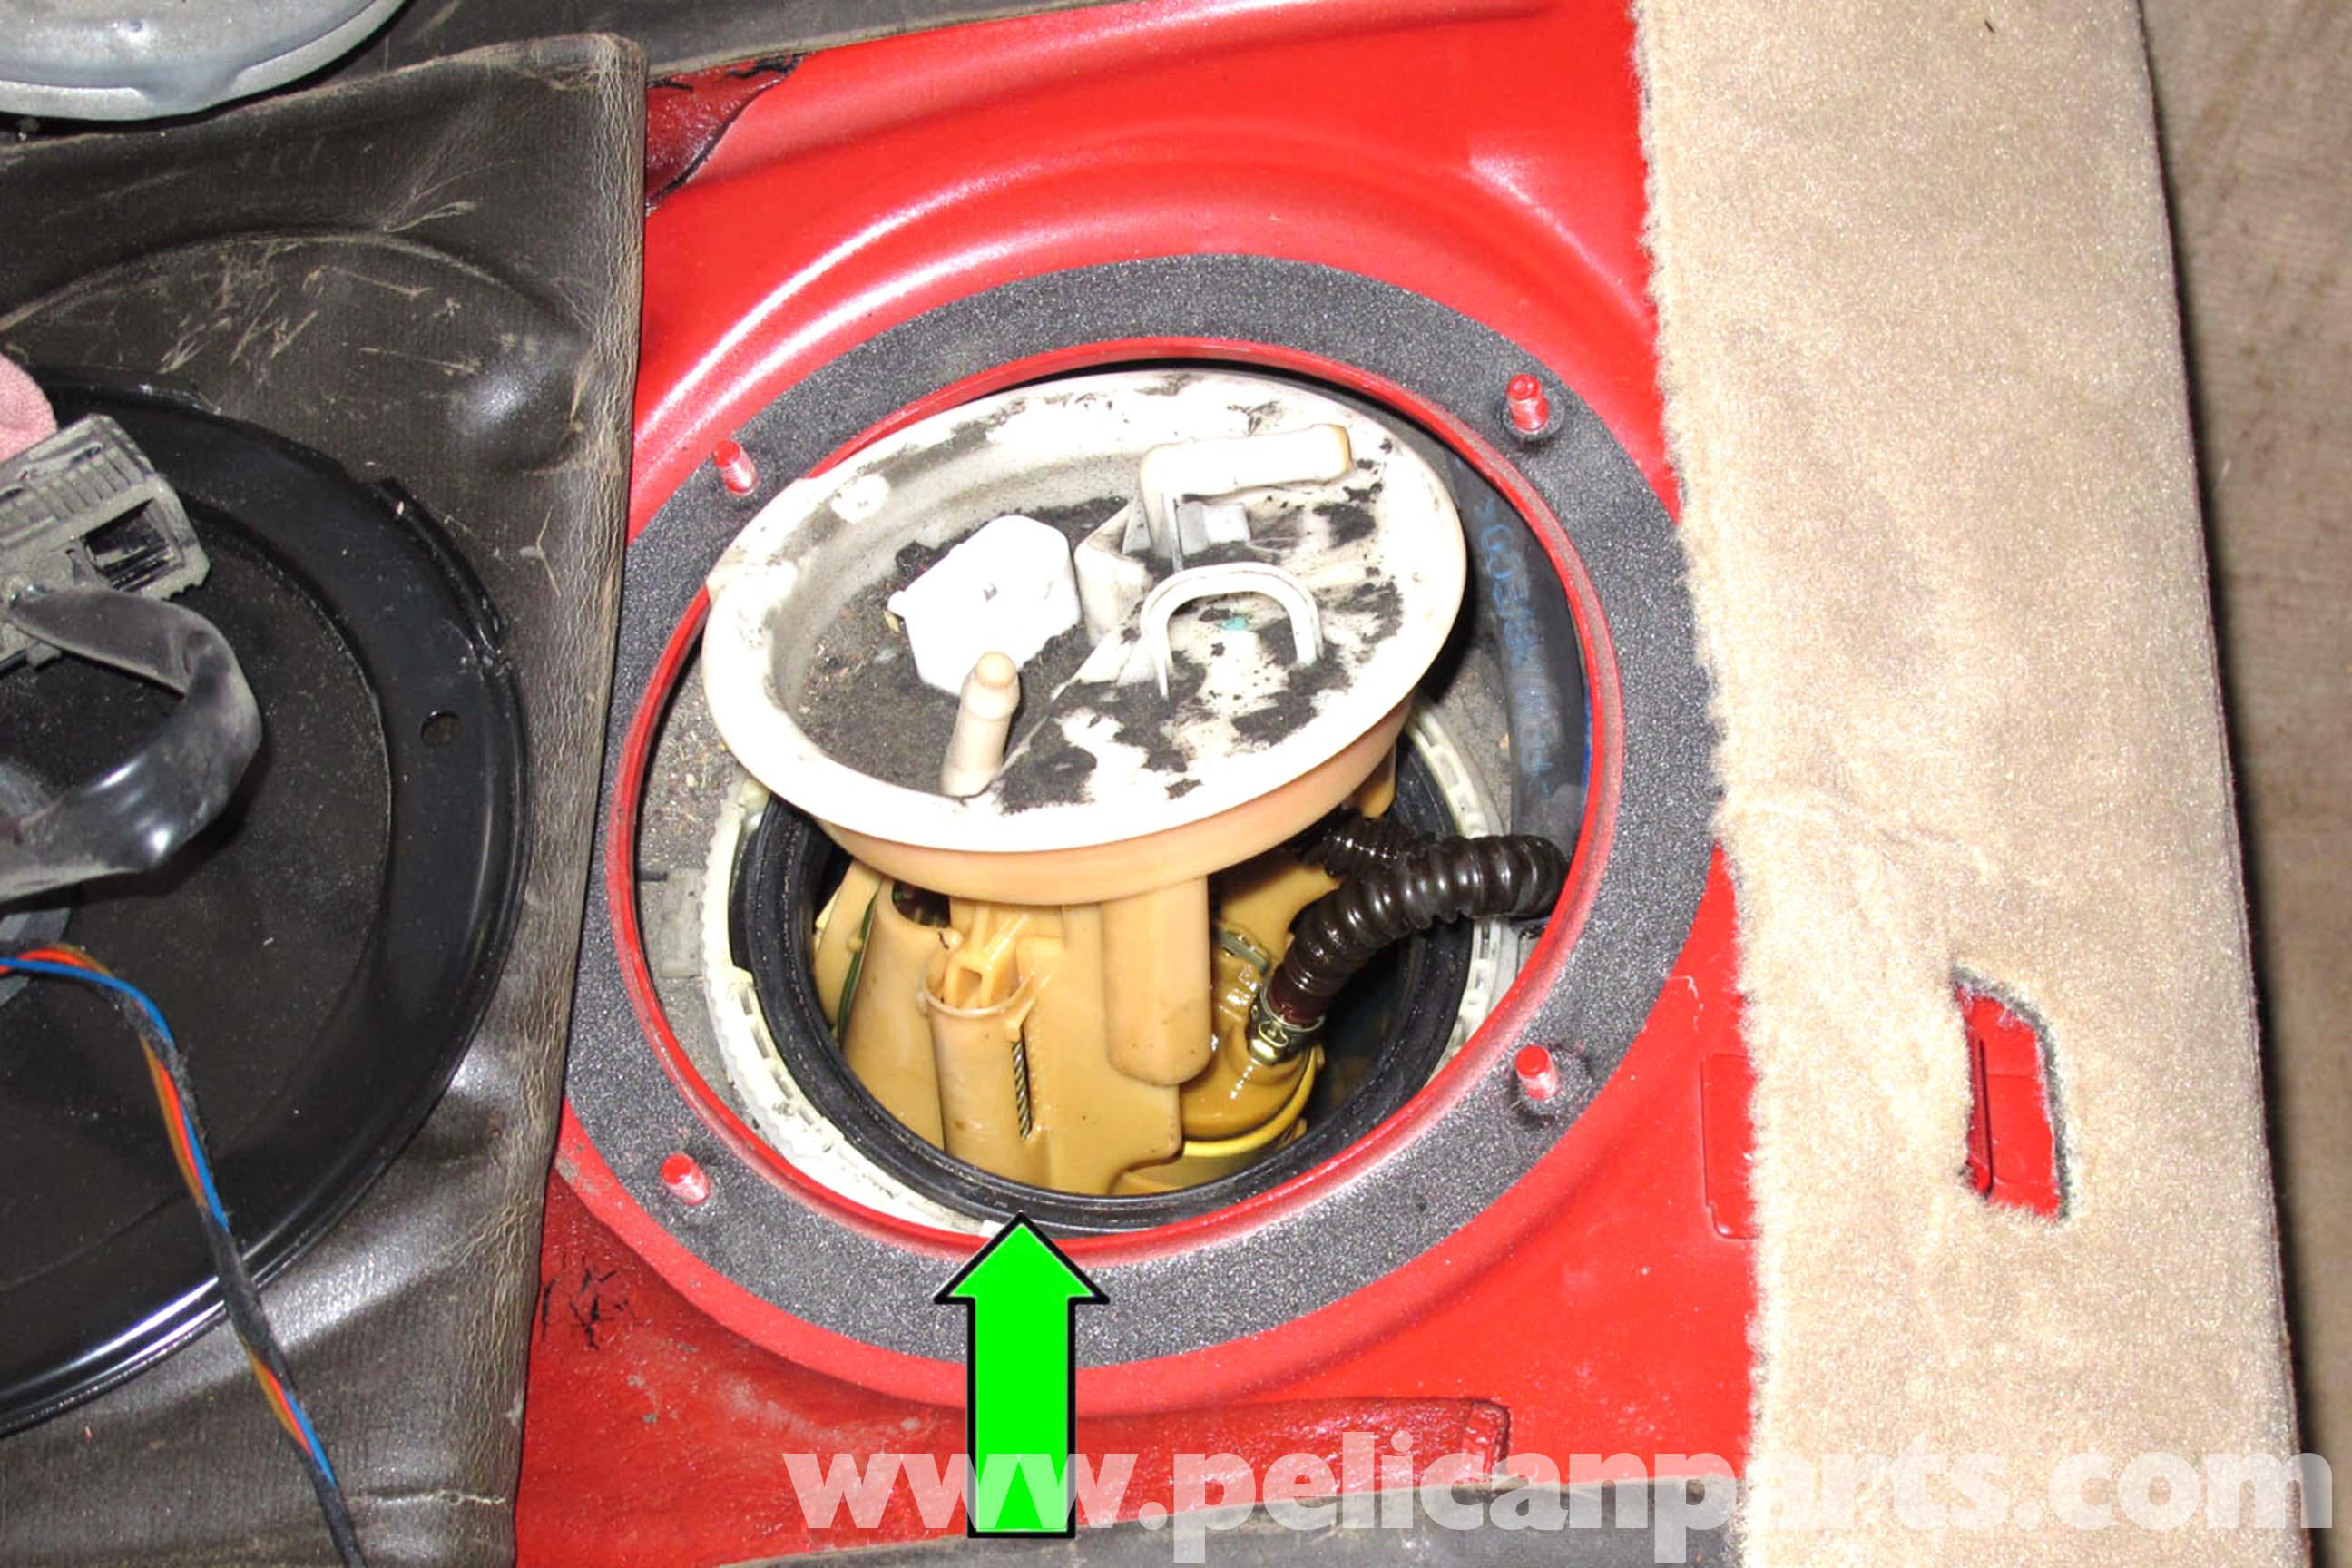 Bmw E46 Fuel Pump Replacement